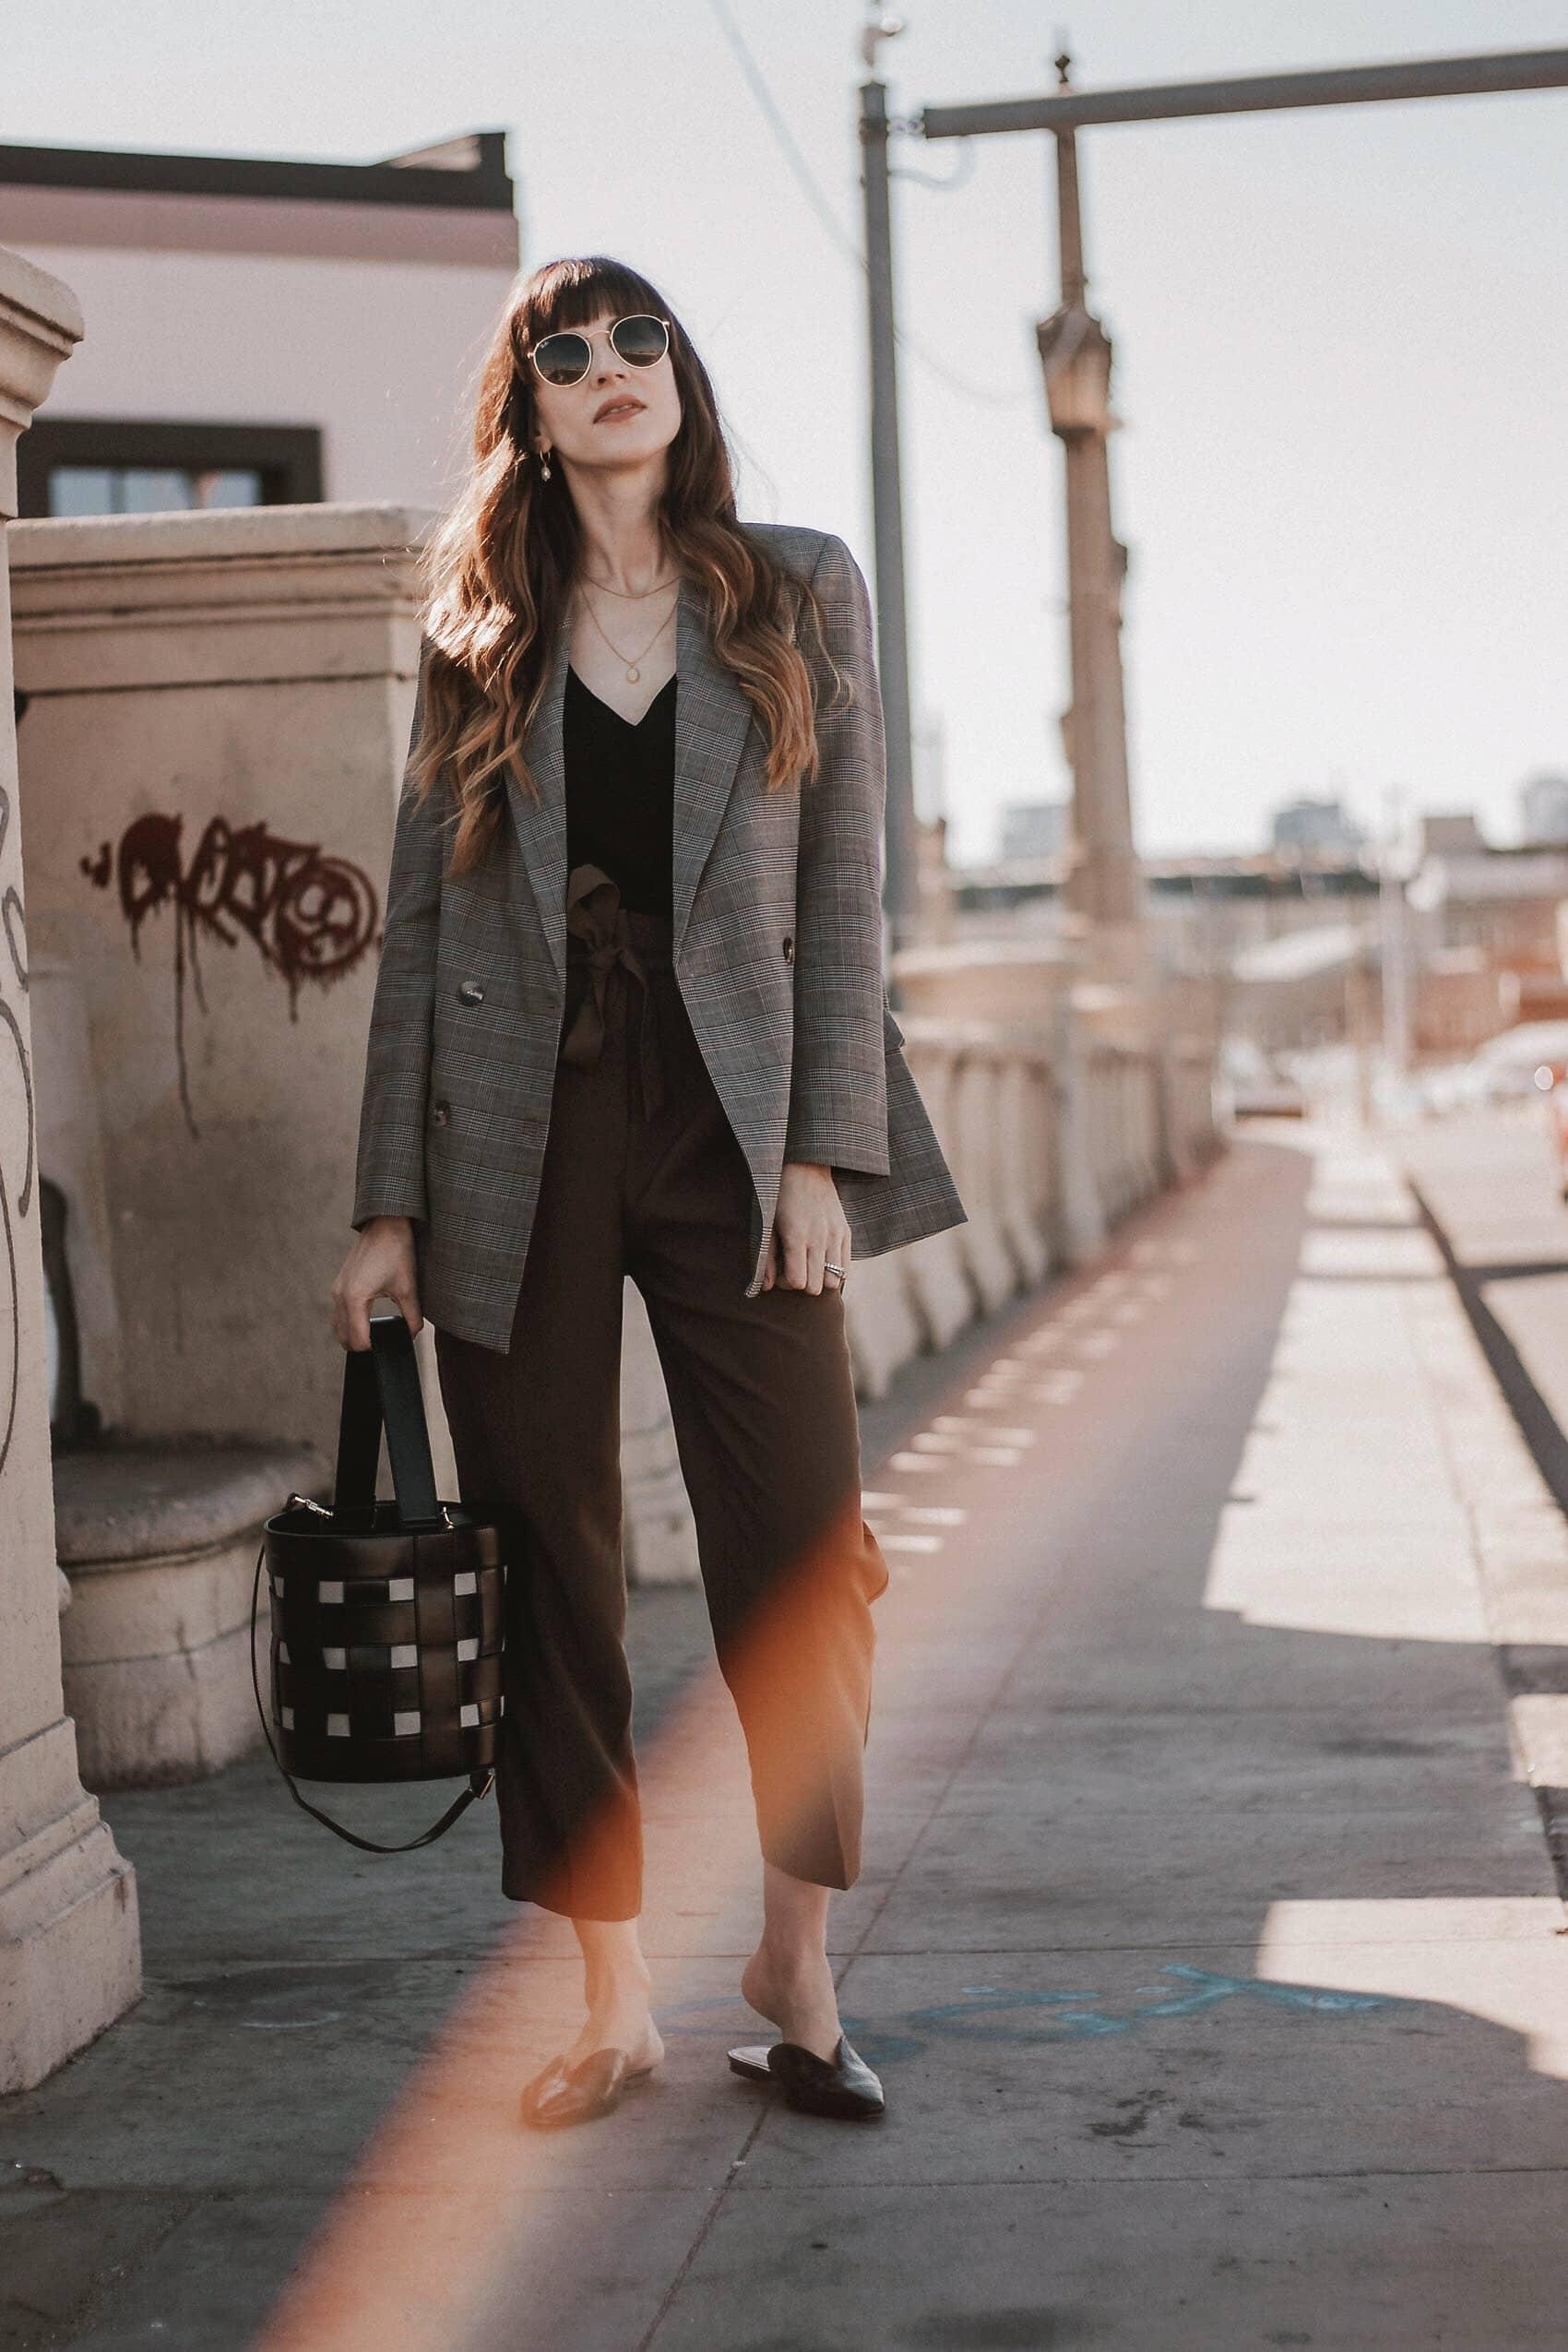 Ethical Fashion Blogger wearing Frank and Oak Blazer